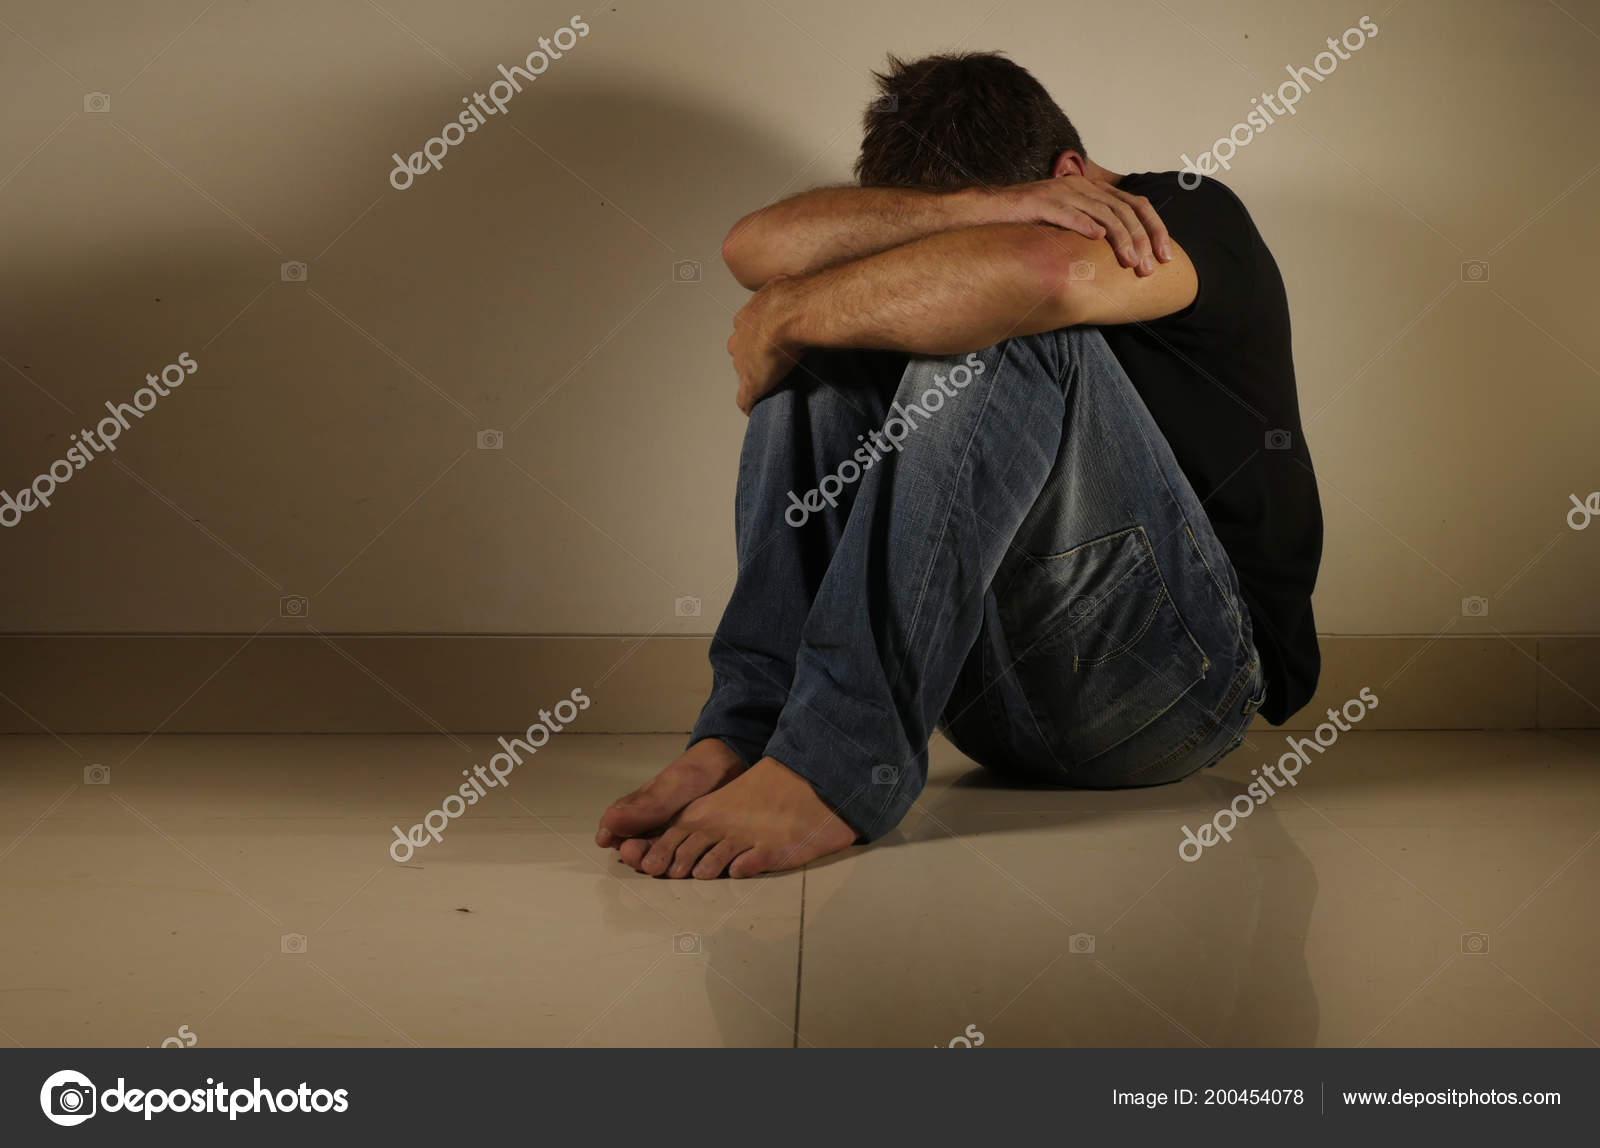 9a572aabaa Νεαρός Απελπισμένος Και Κατάθλιψη Κλαίει Μόνο Συνεδρίαση Στο Σπίτι Όροφο —  Φωτογραφία Αρχείου